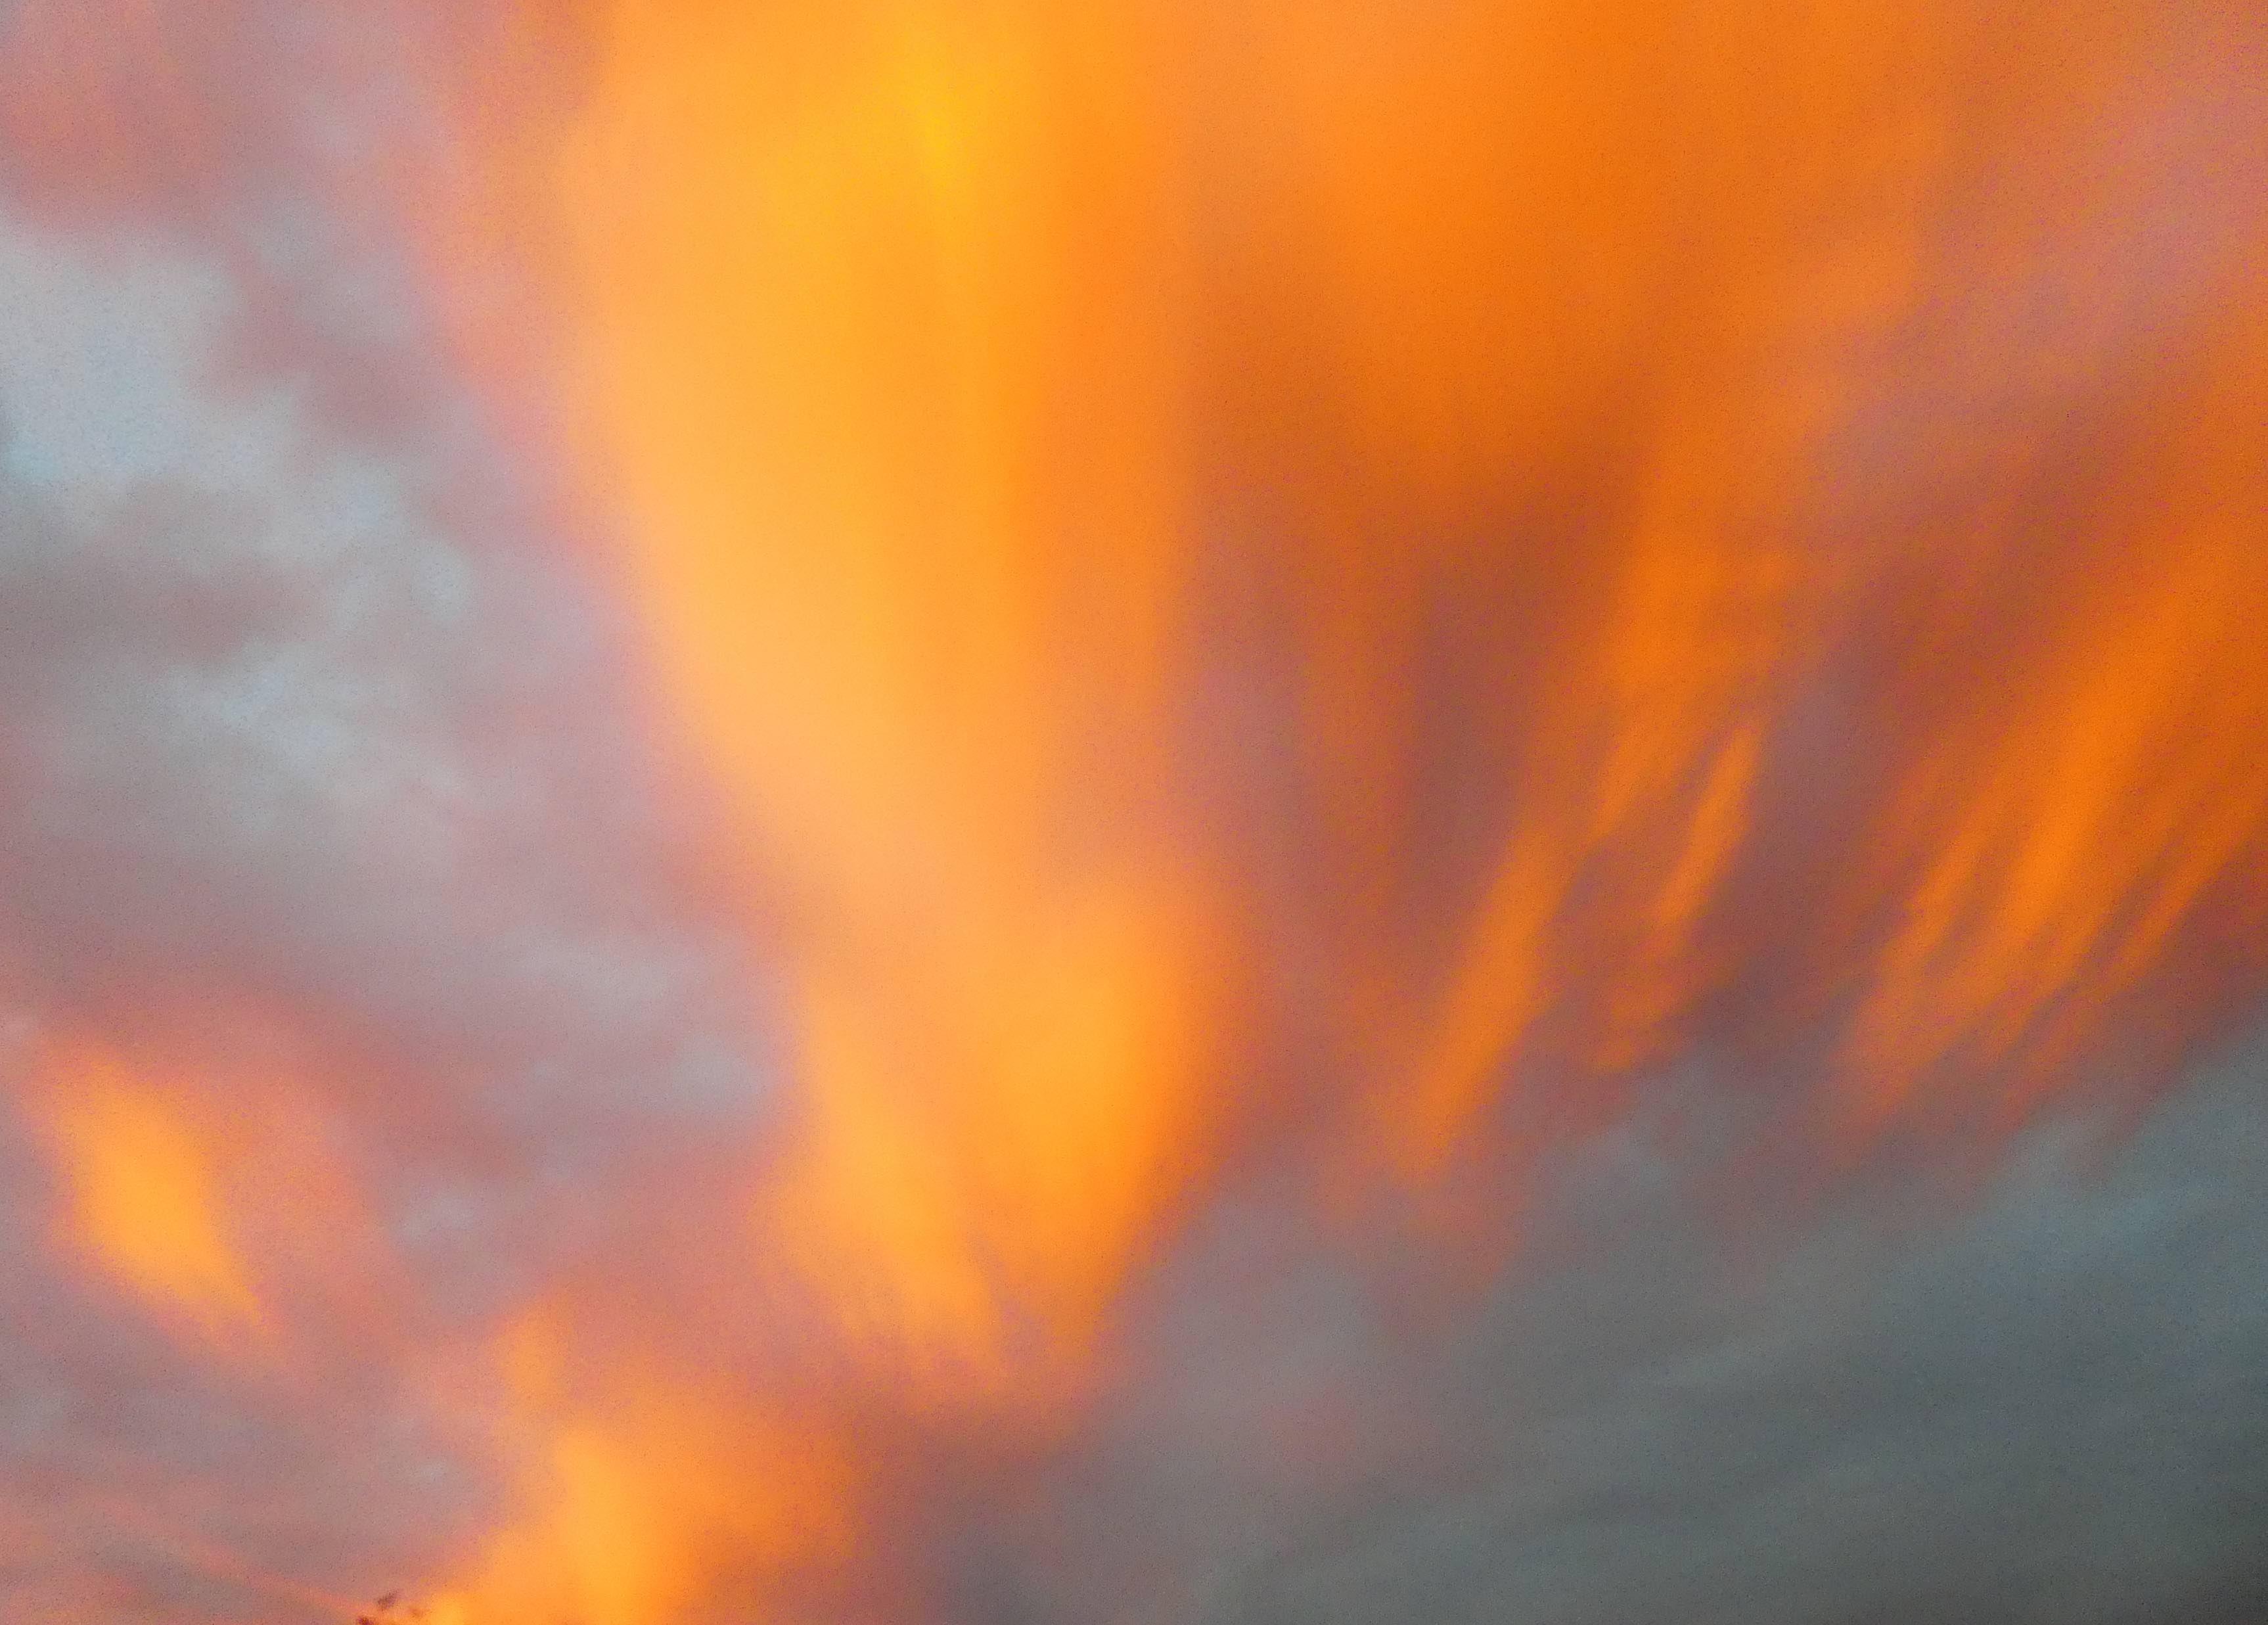 6.sunset